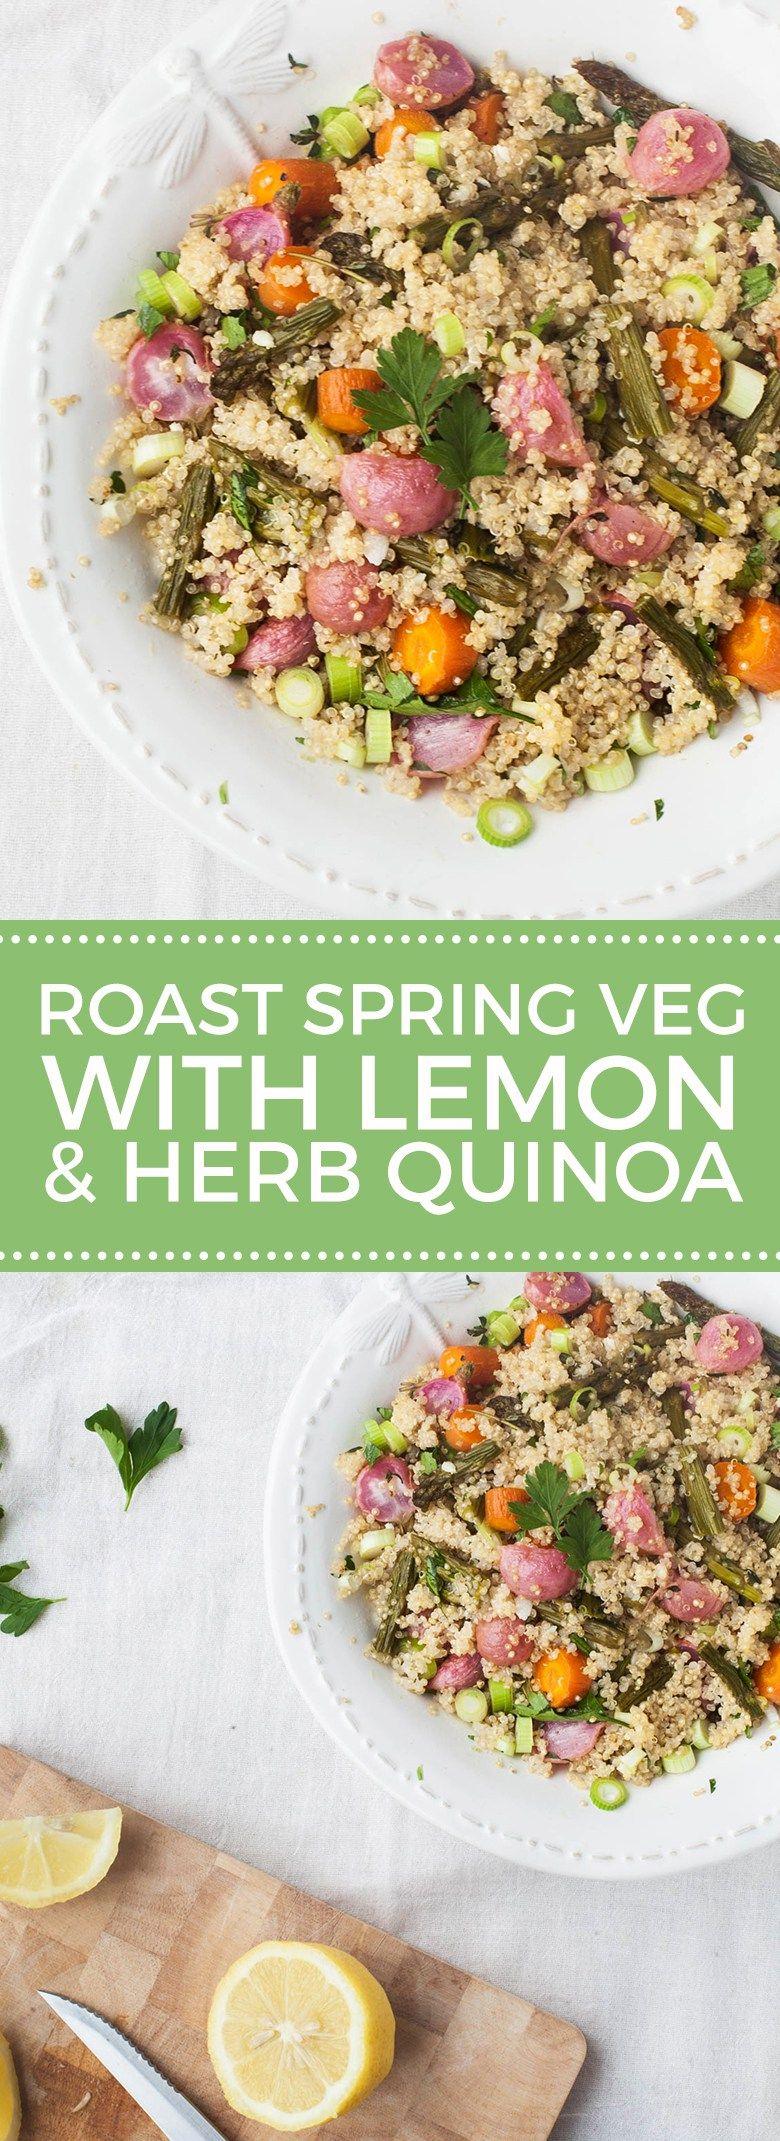 Vegan Roast Spring Vegetables with Lemon & Herb Quinoa